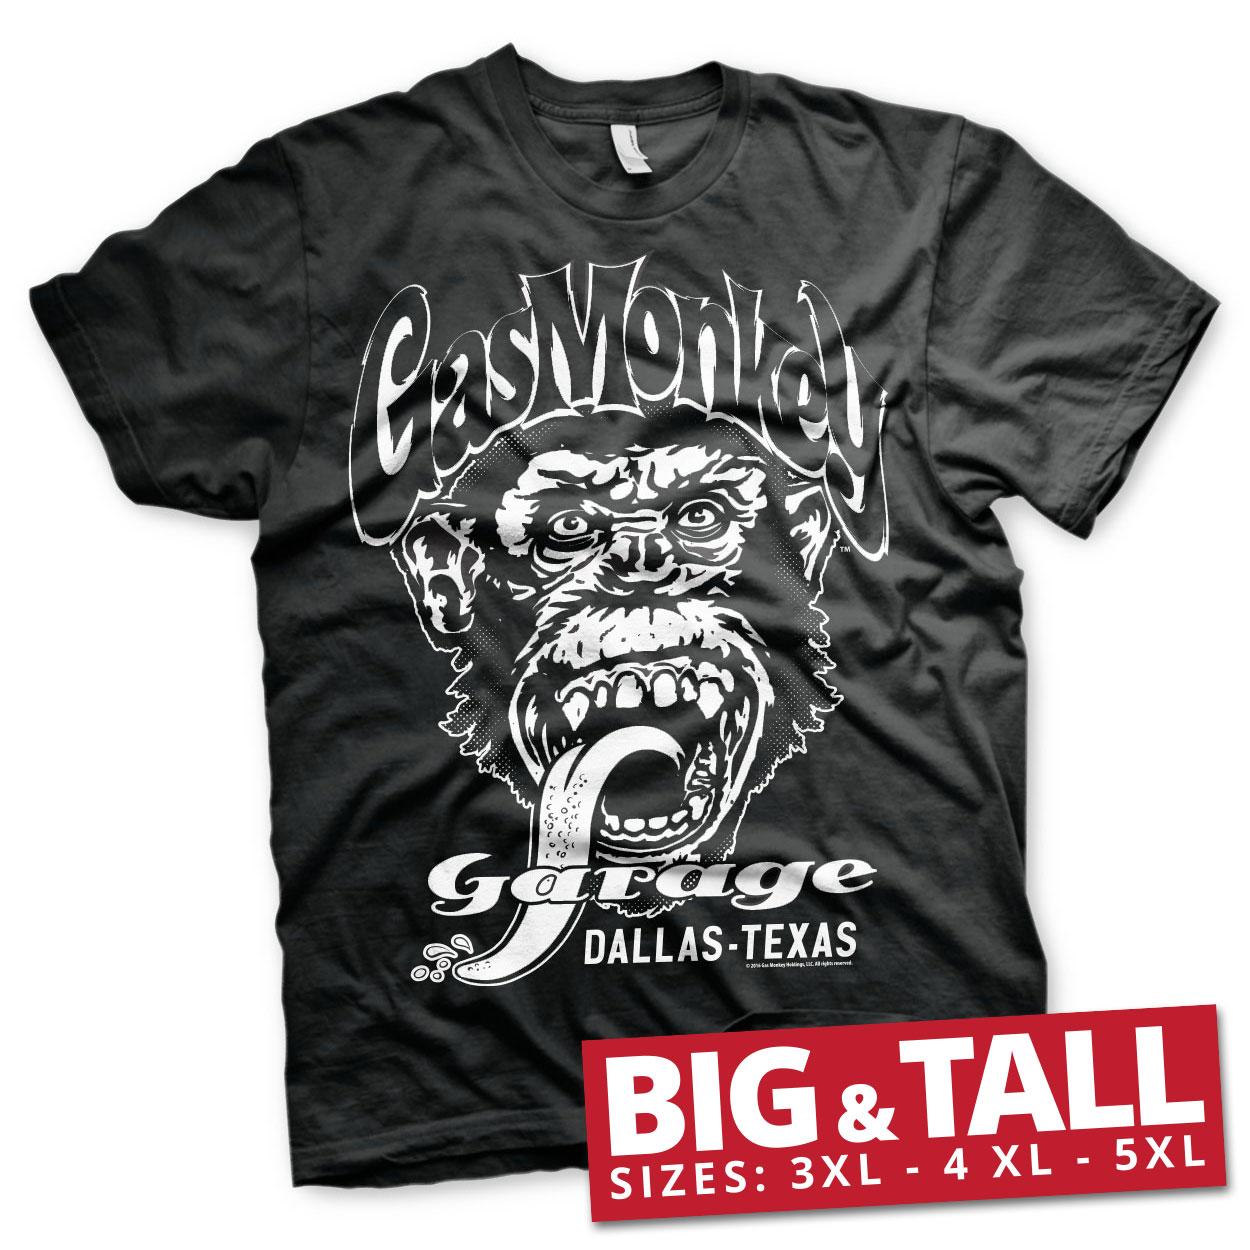 Gas Monkey Garage - Dallas, Texas T-Shirt